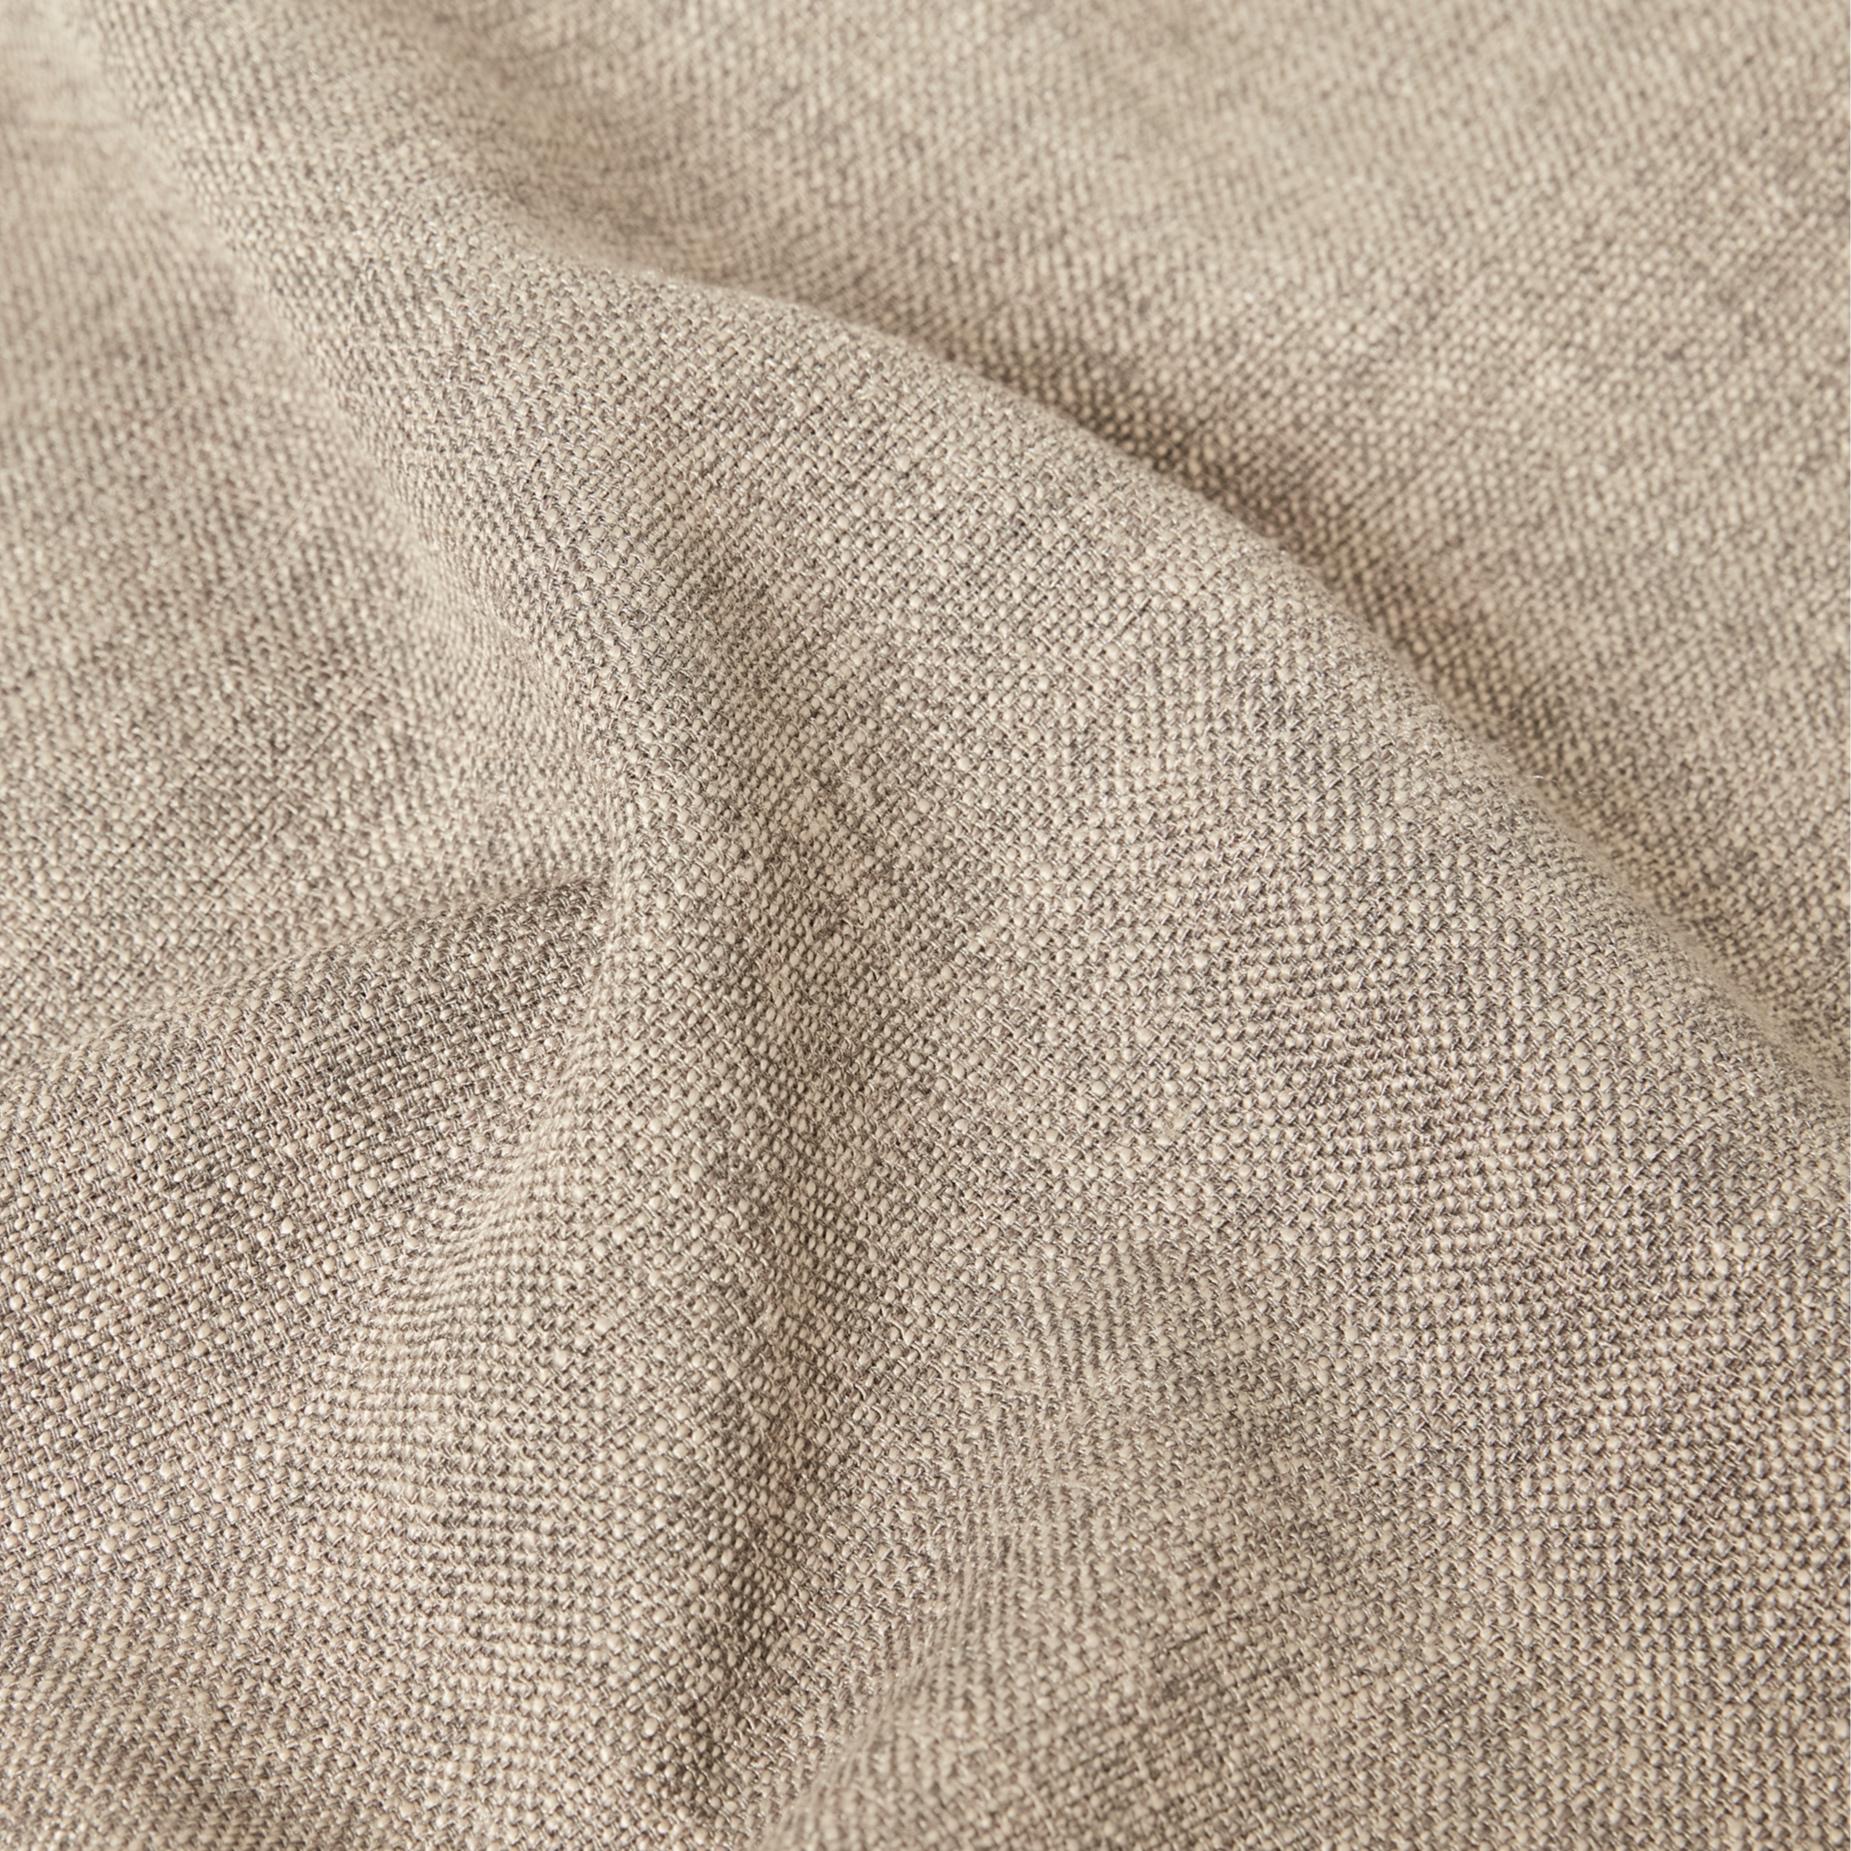 Rustic - Warm Sand(1).jpg